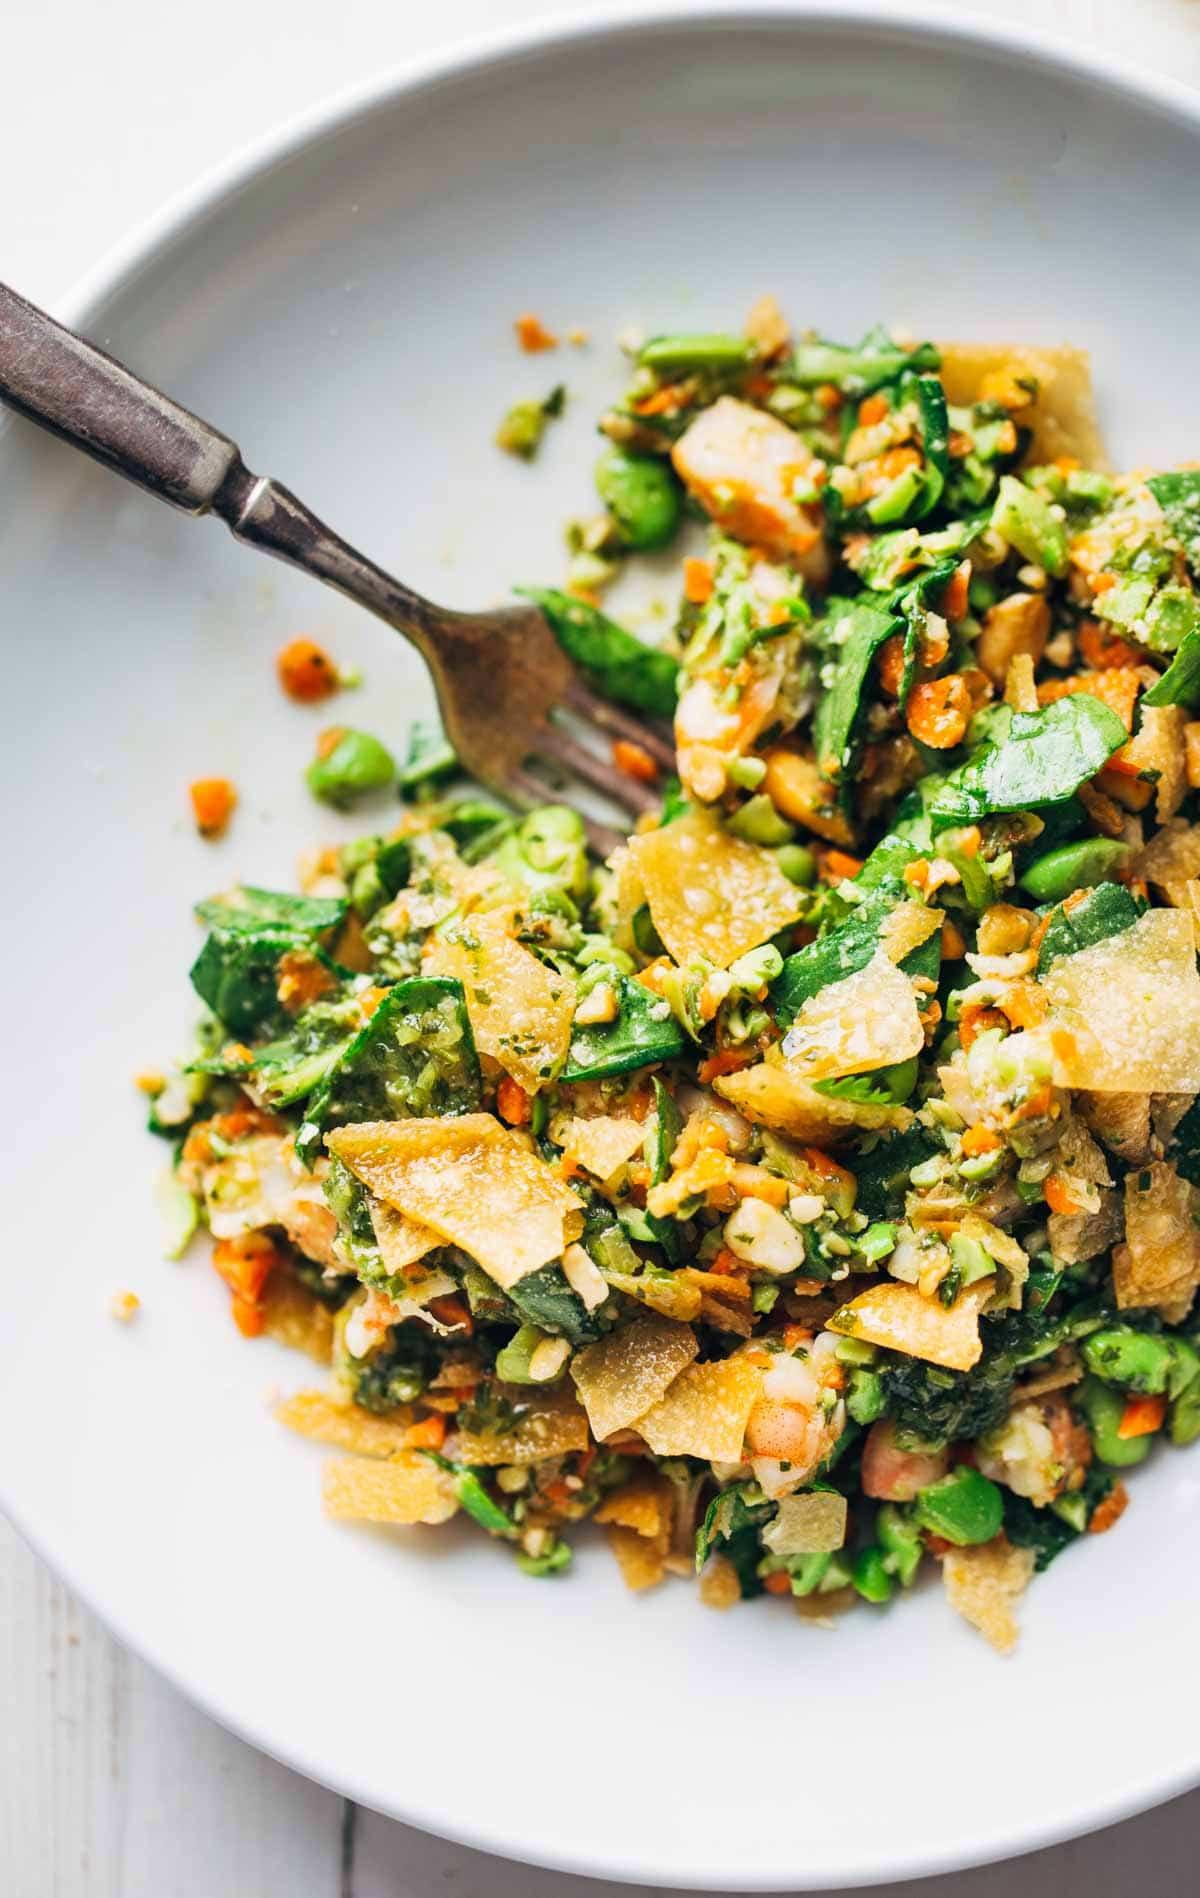 Thai Shrimp Salad  Chopped Thai Shrimp Salad with Garlic Lime Dressing Recipe